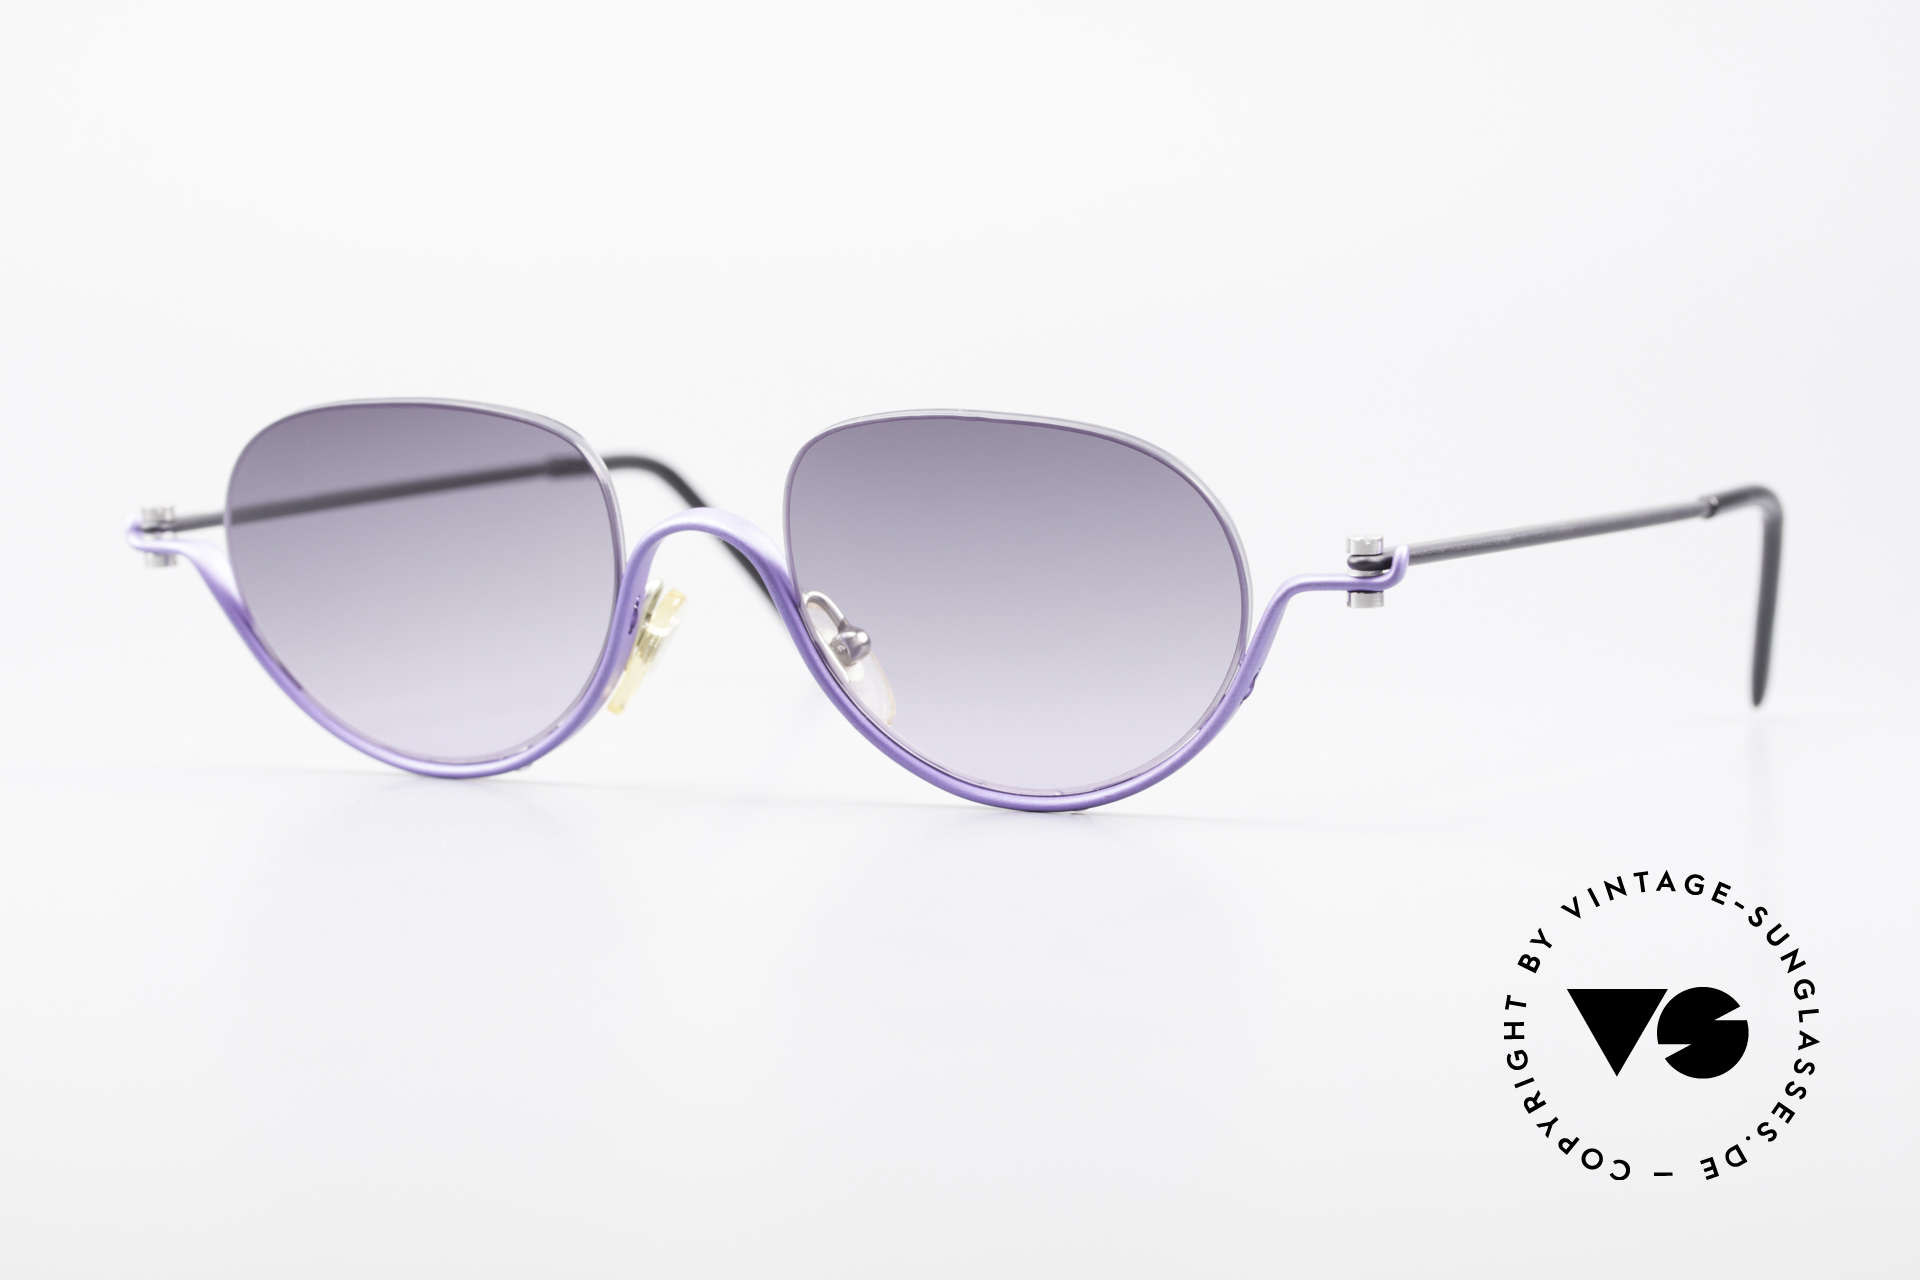 ProDesign No8 Gail Spence Design Sunglasses, Pro Design N°EIGHT - Optic Studio Denmark Shades, Made for Women